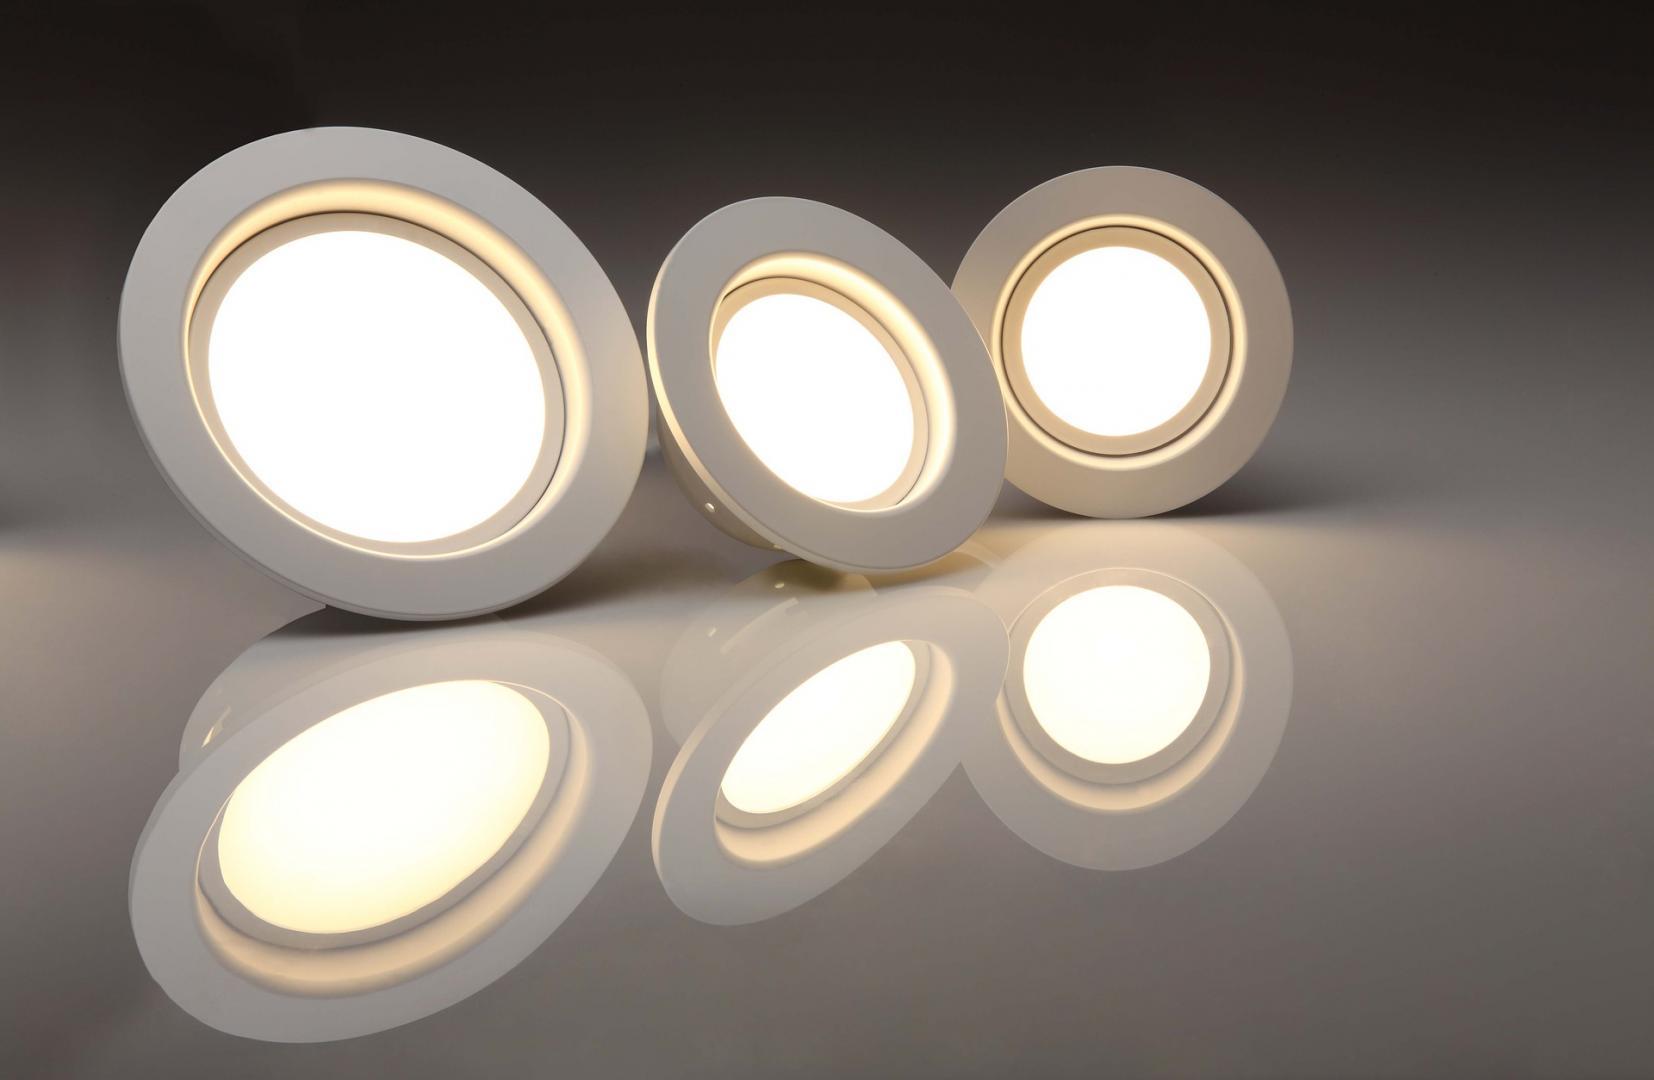 LED Lighting upgrade downlights